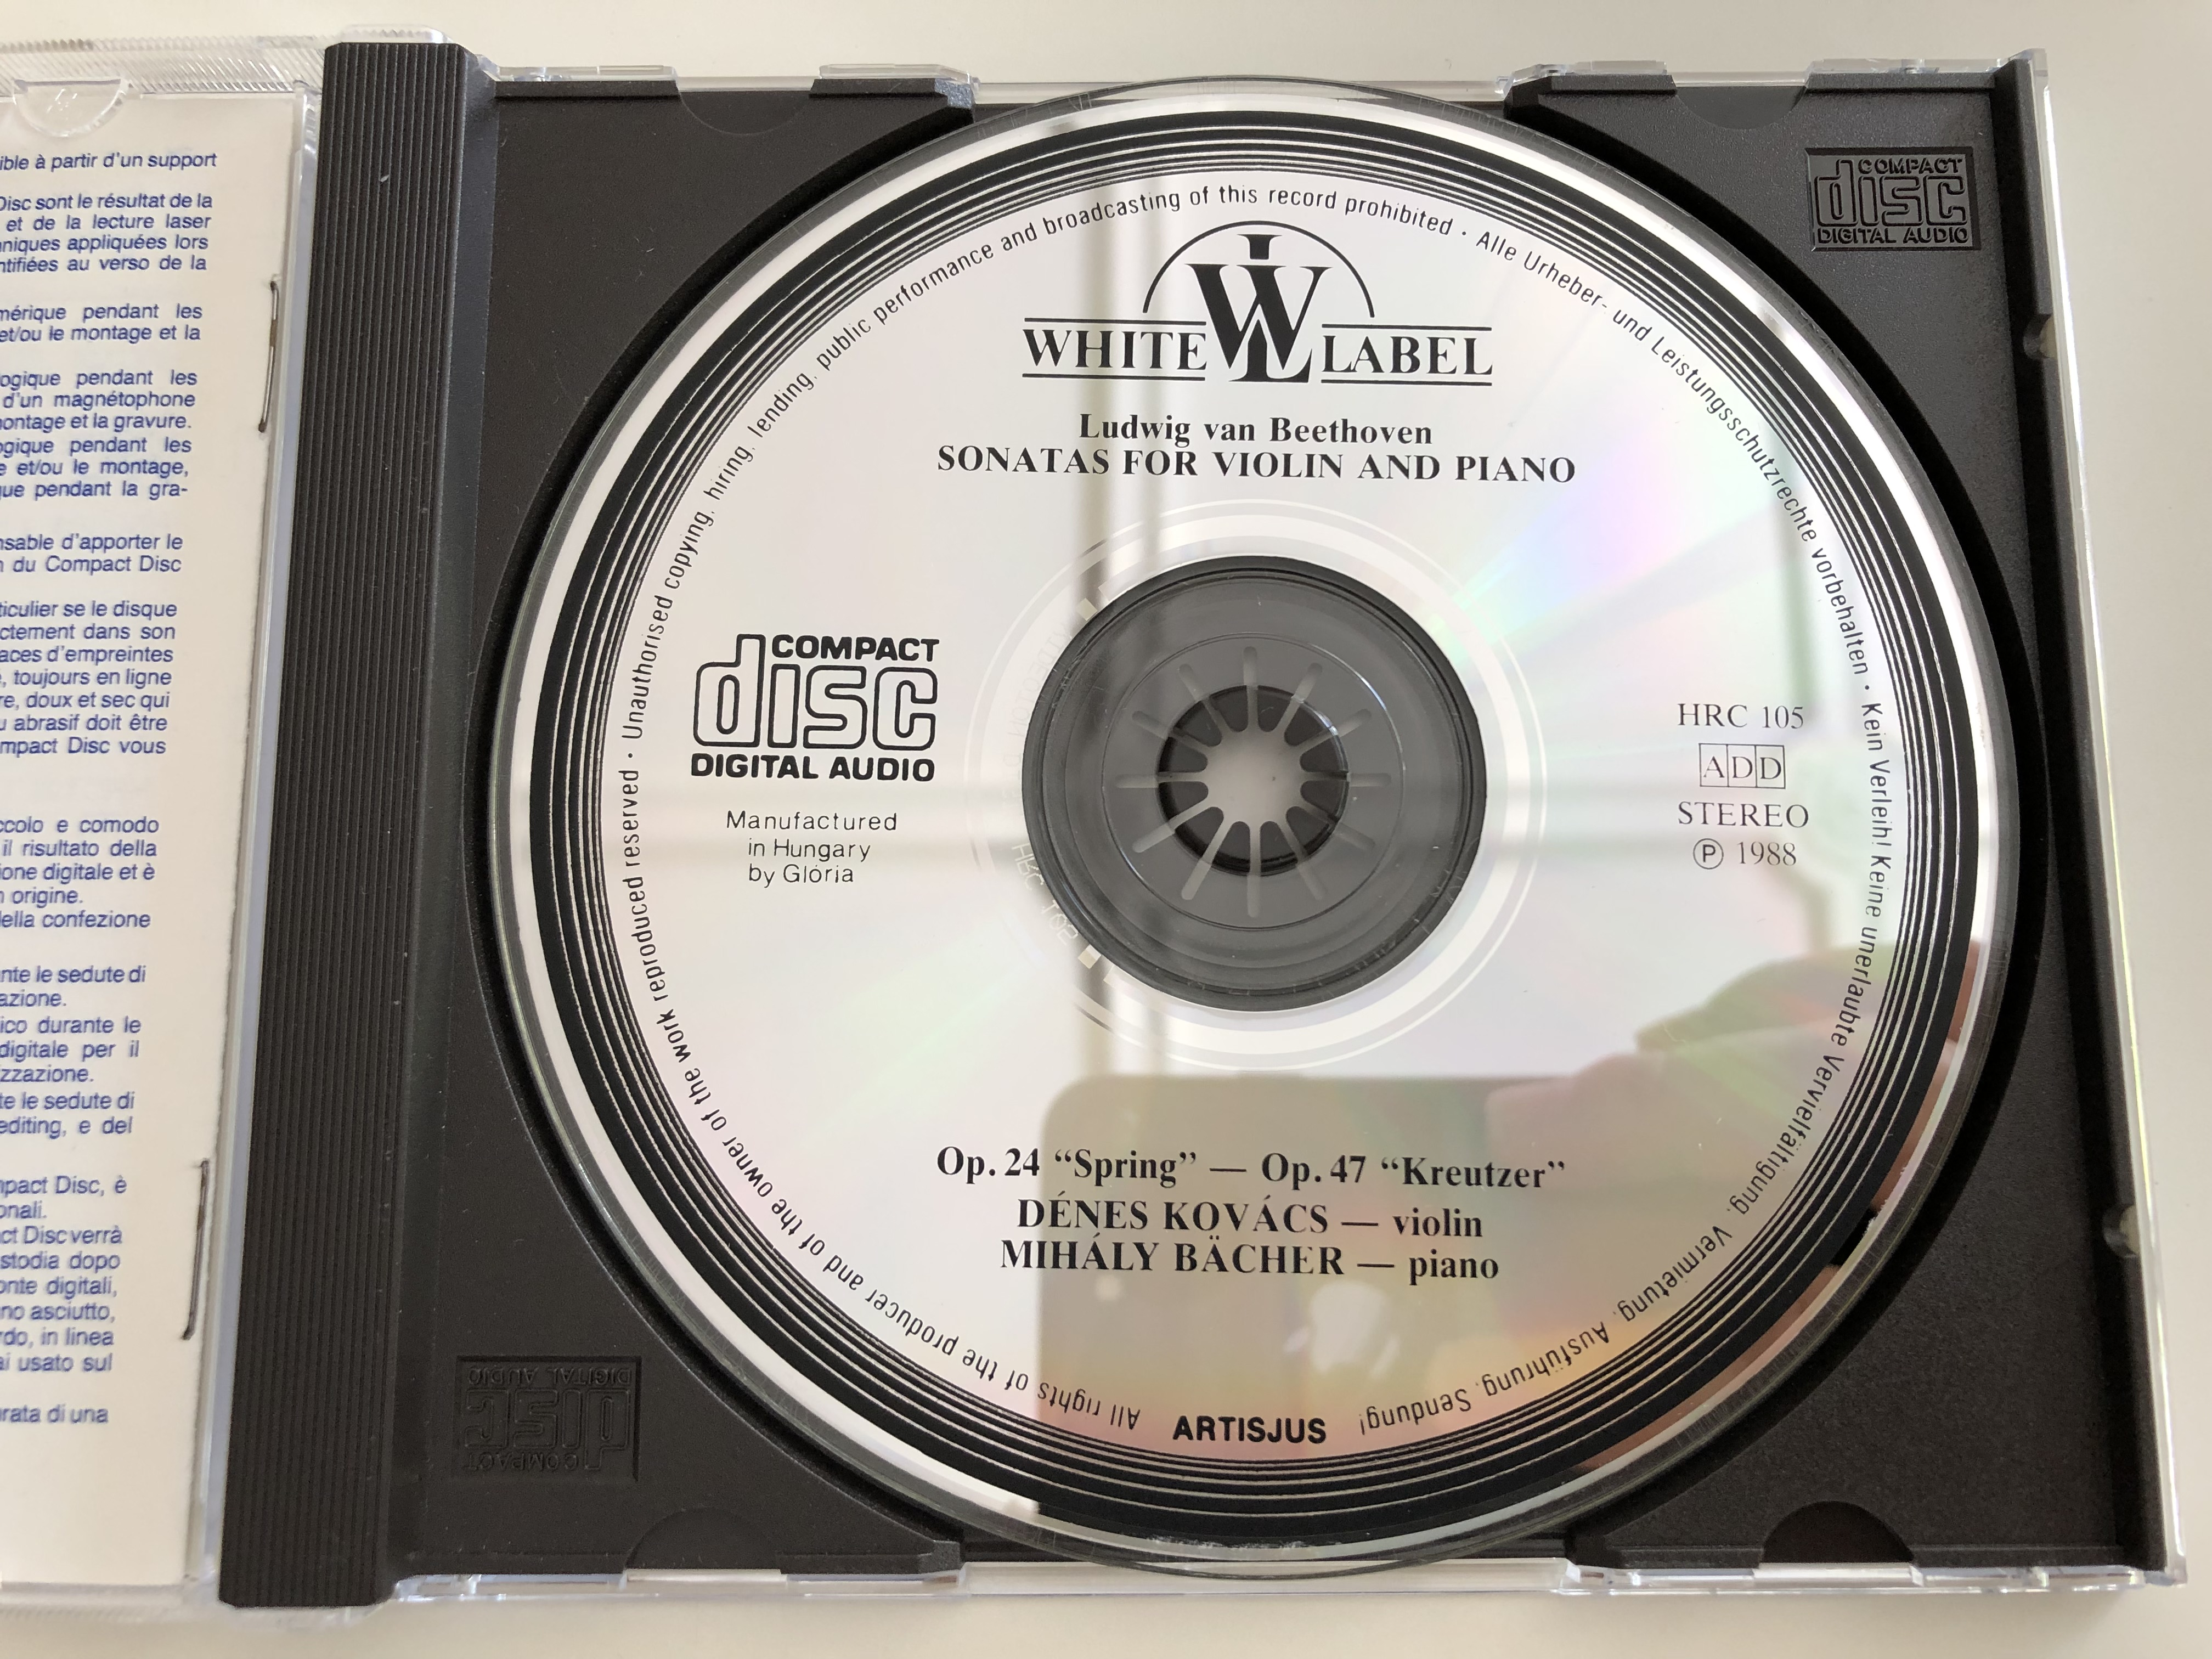 beethoven-violin-sonatas-spring-kreutzer-d-nes-kov-cs-mih-ly-b-cher-hungaroton-white-label-hrc-105-audio-cd-1988-4-.jpg